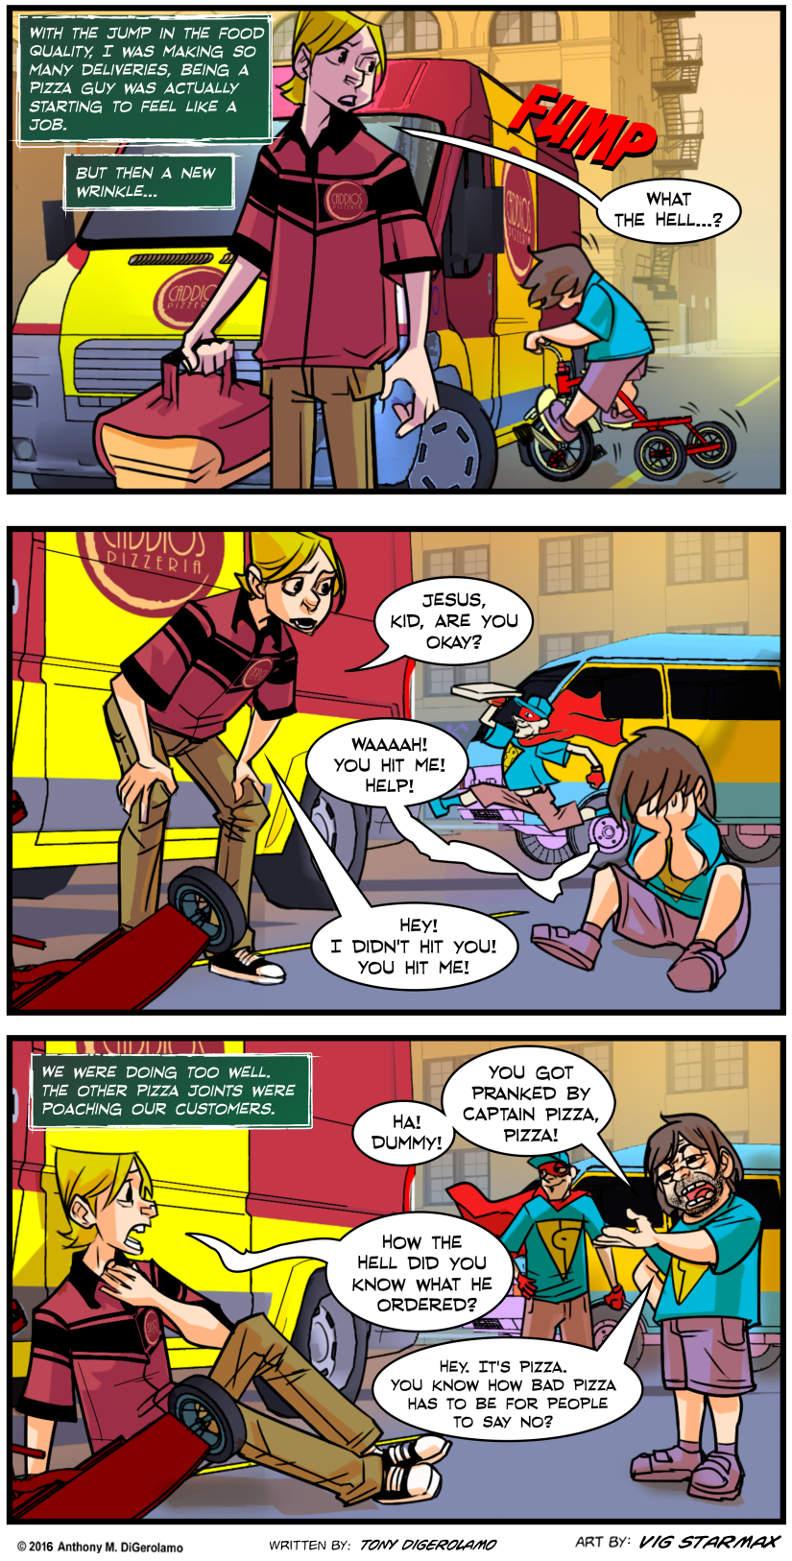 Tales of Pizza:  Pizza Poacher